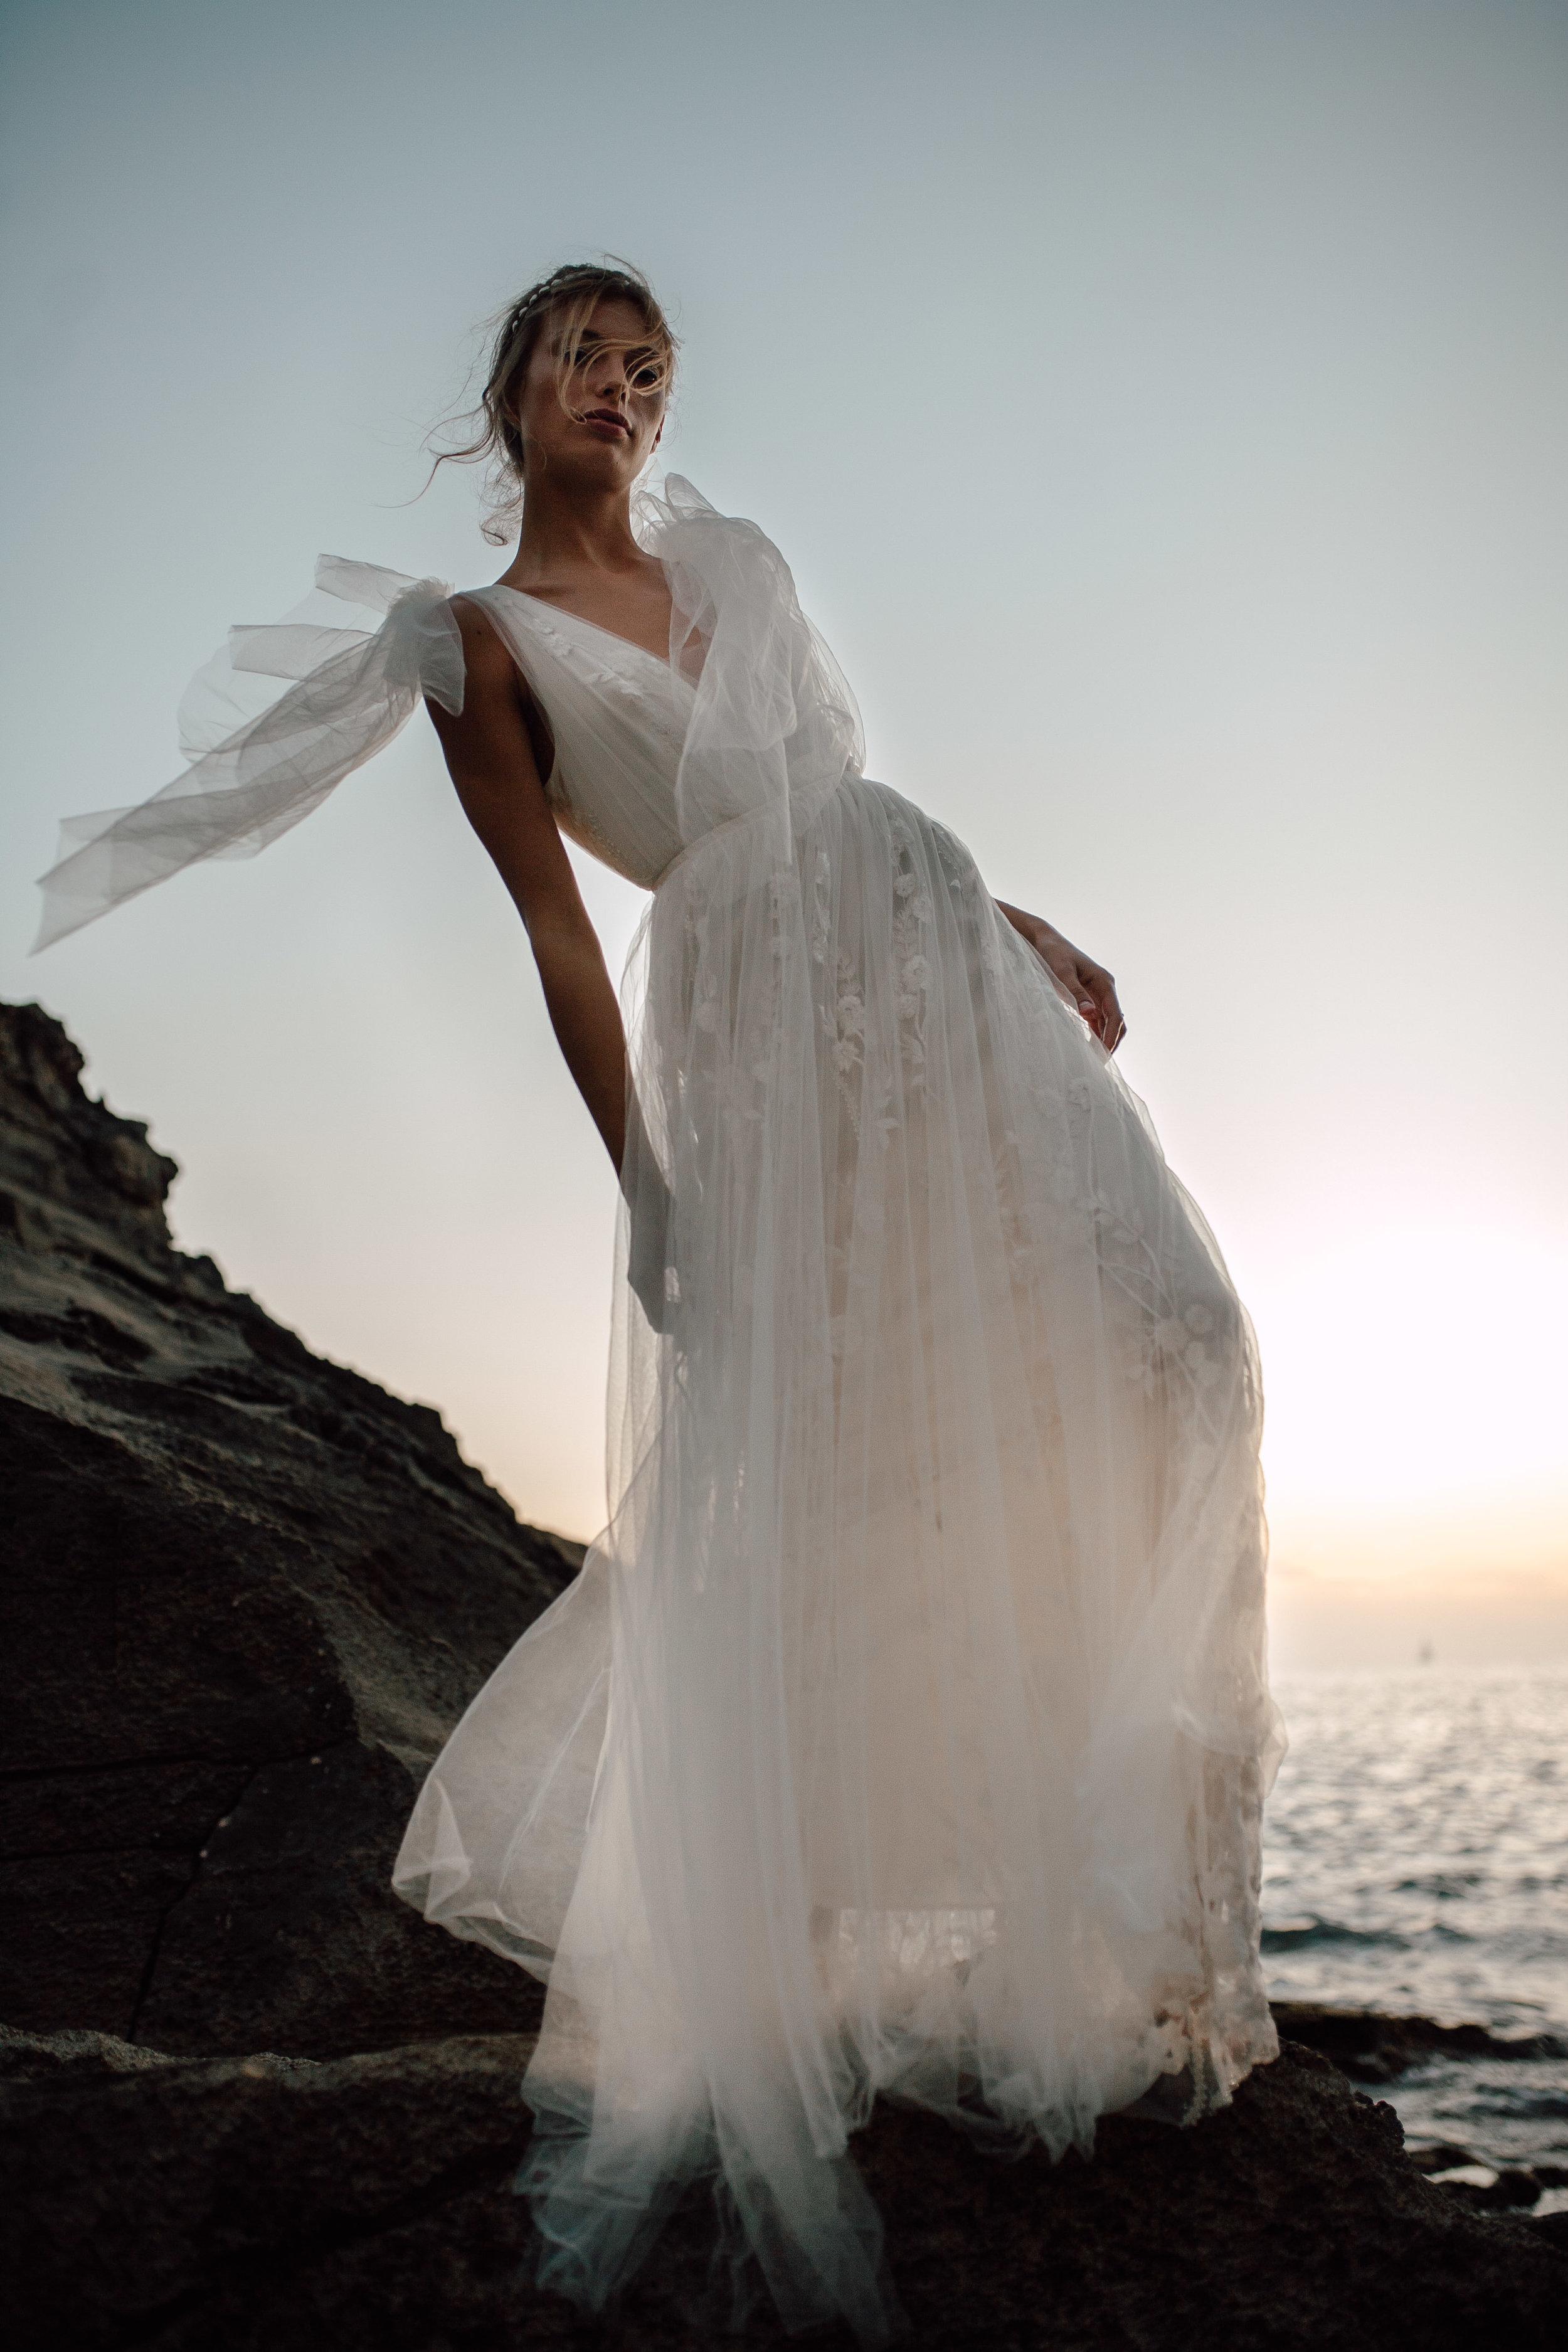 Mallorca-Pia-Anna-Christian-Wedding-Photography-Ritual-Unions-Maria-129.jpg